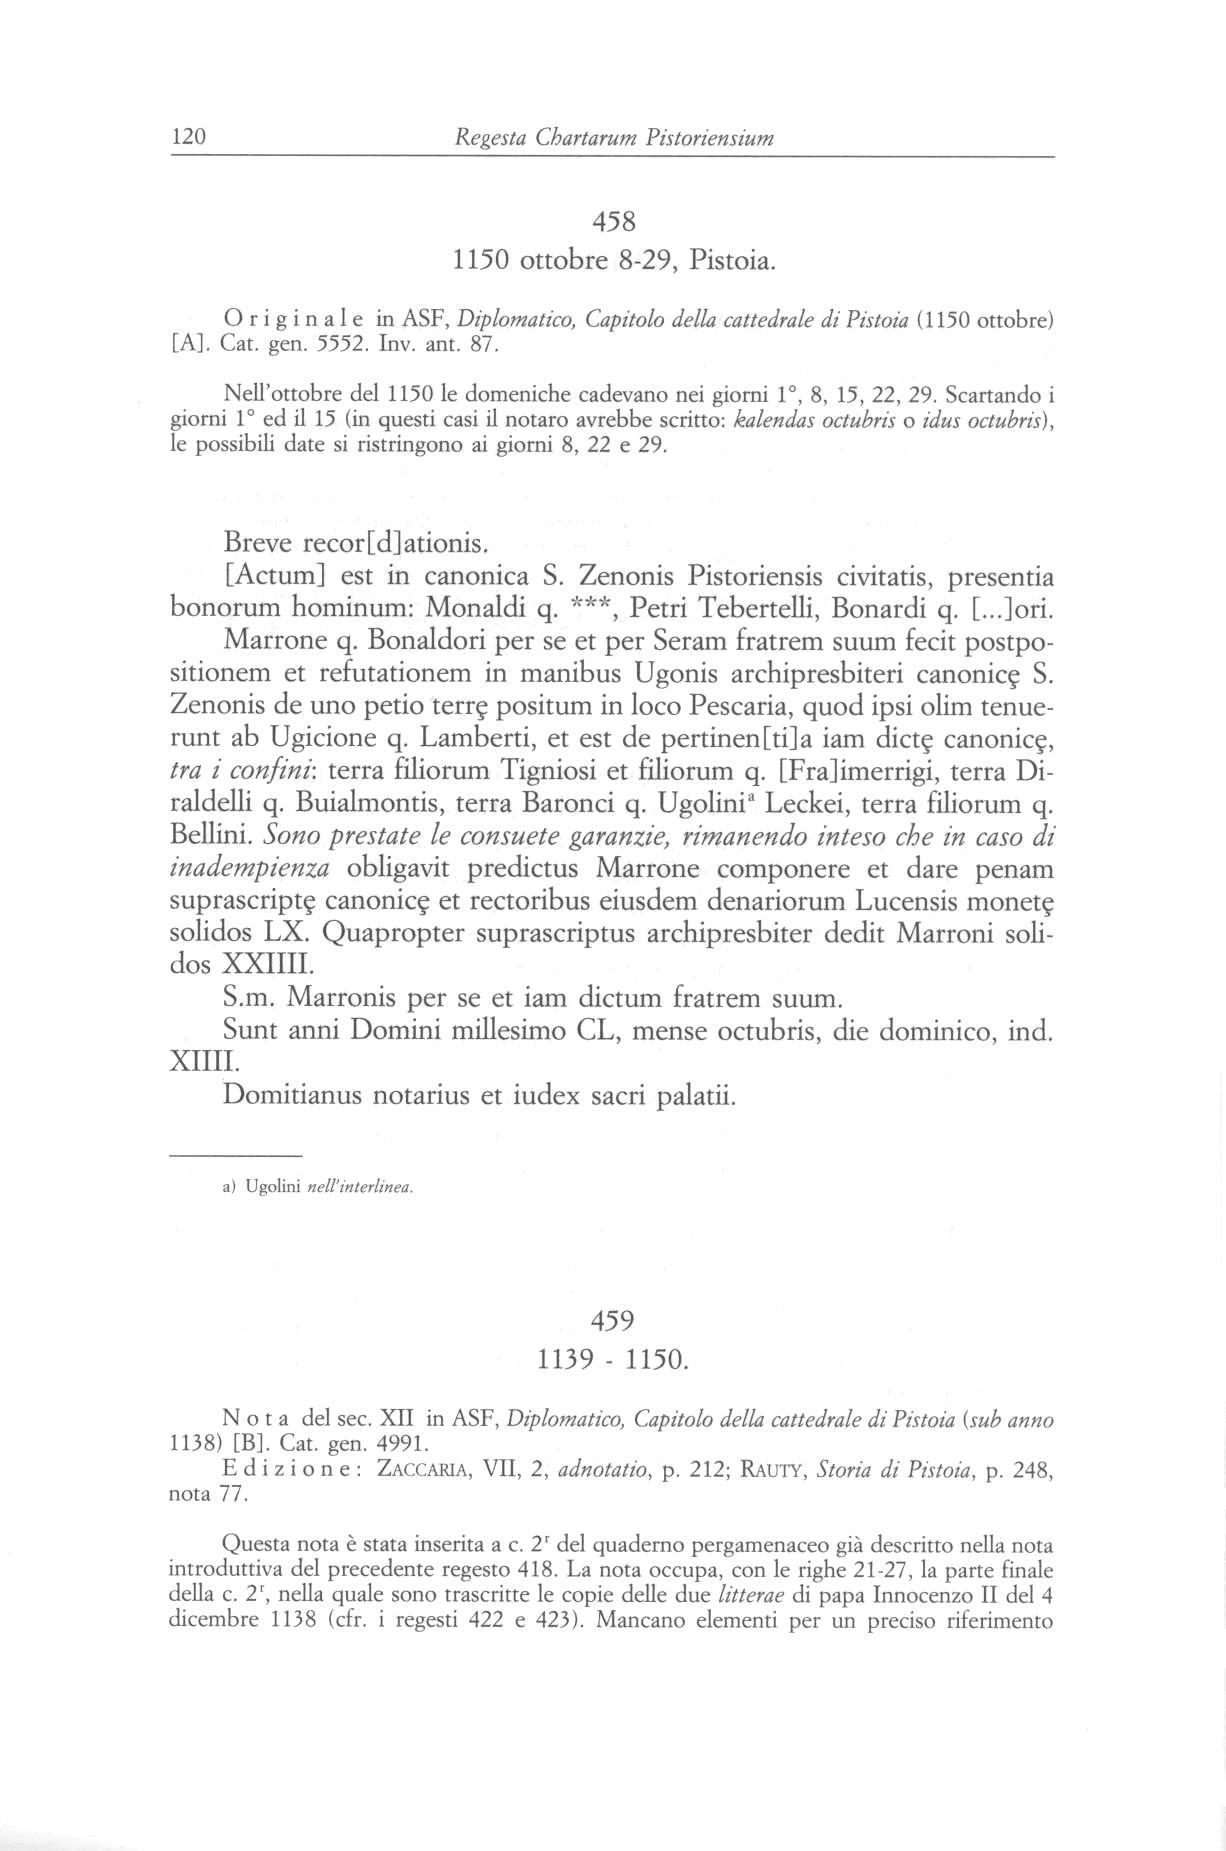 Canonica S. Zenone XII 0120.jpg